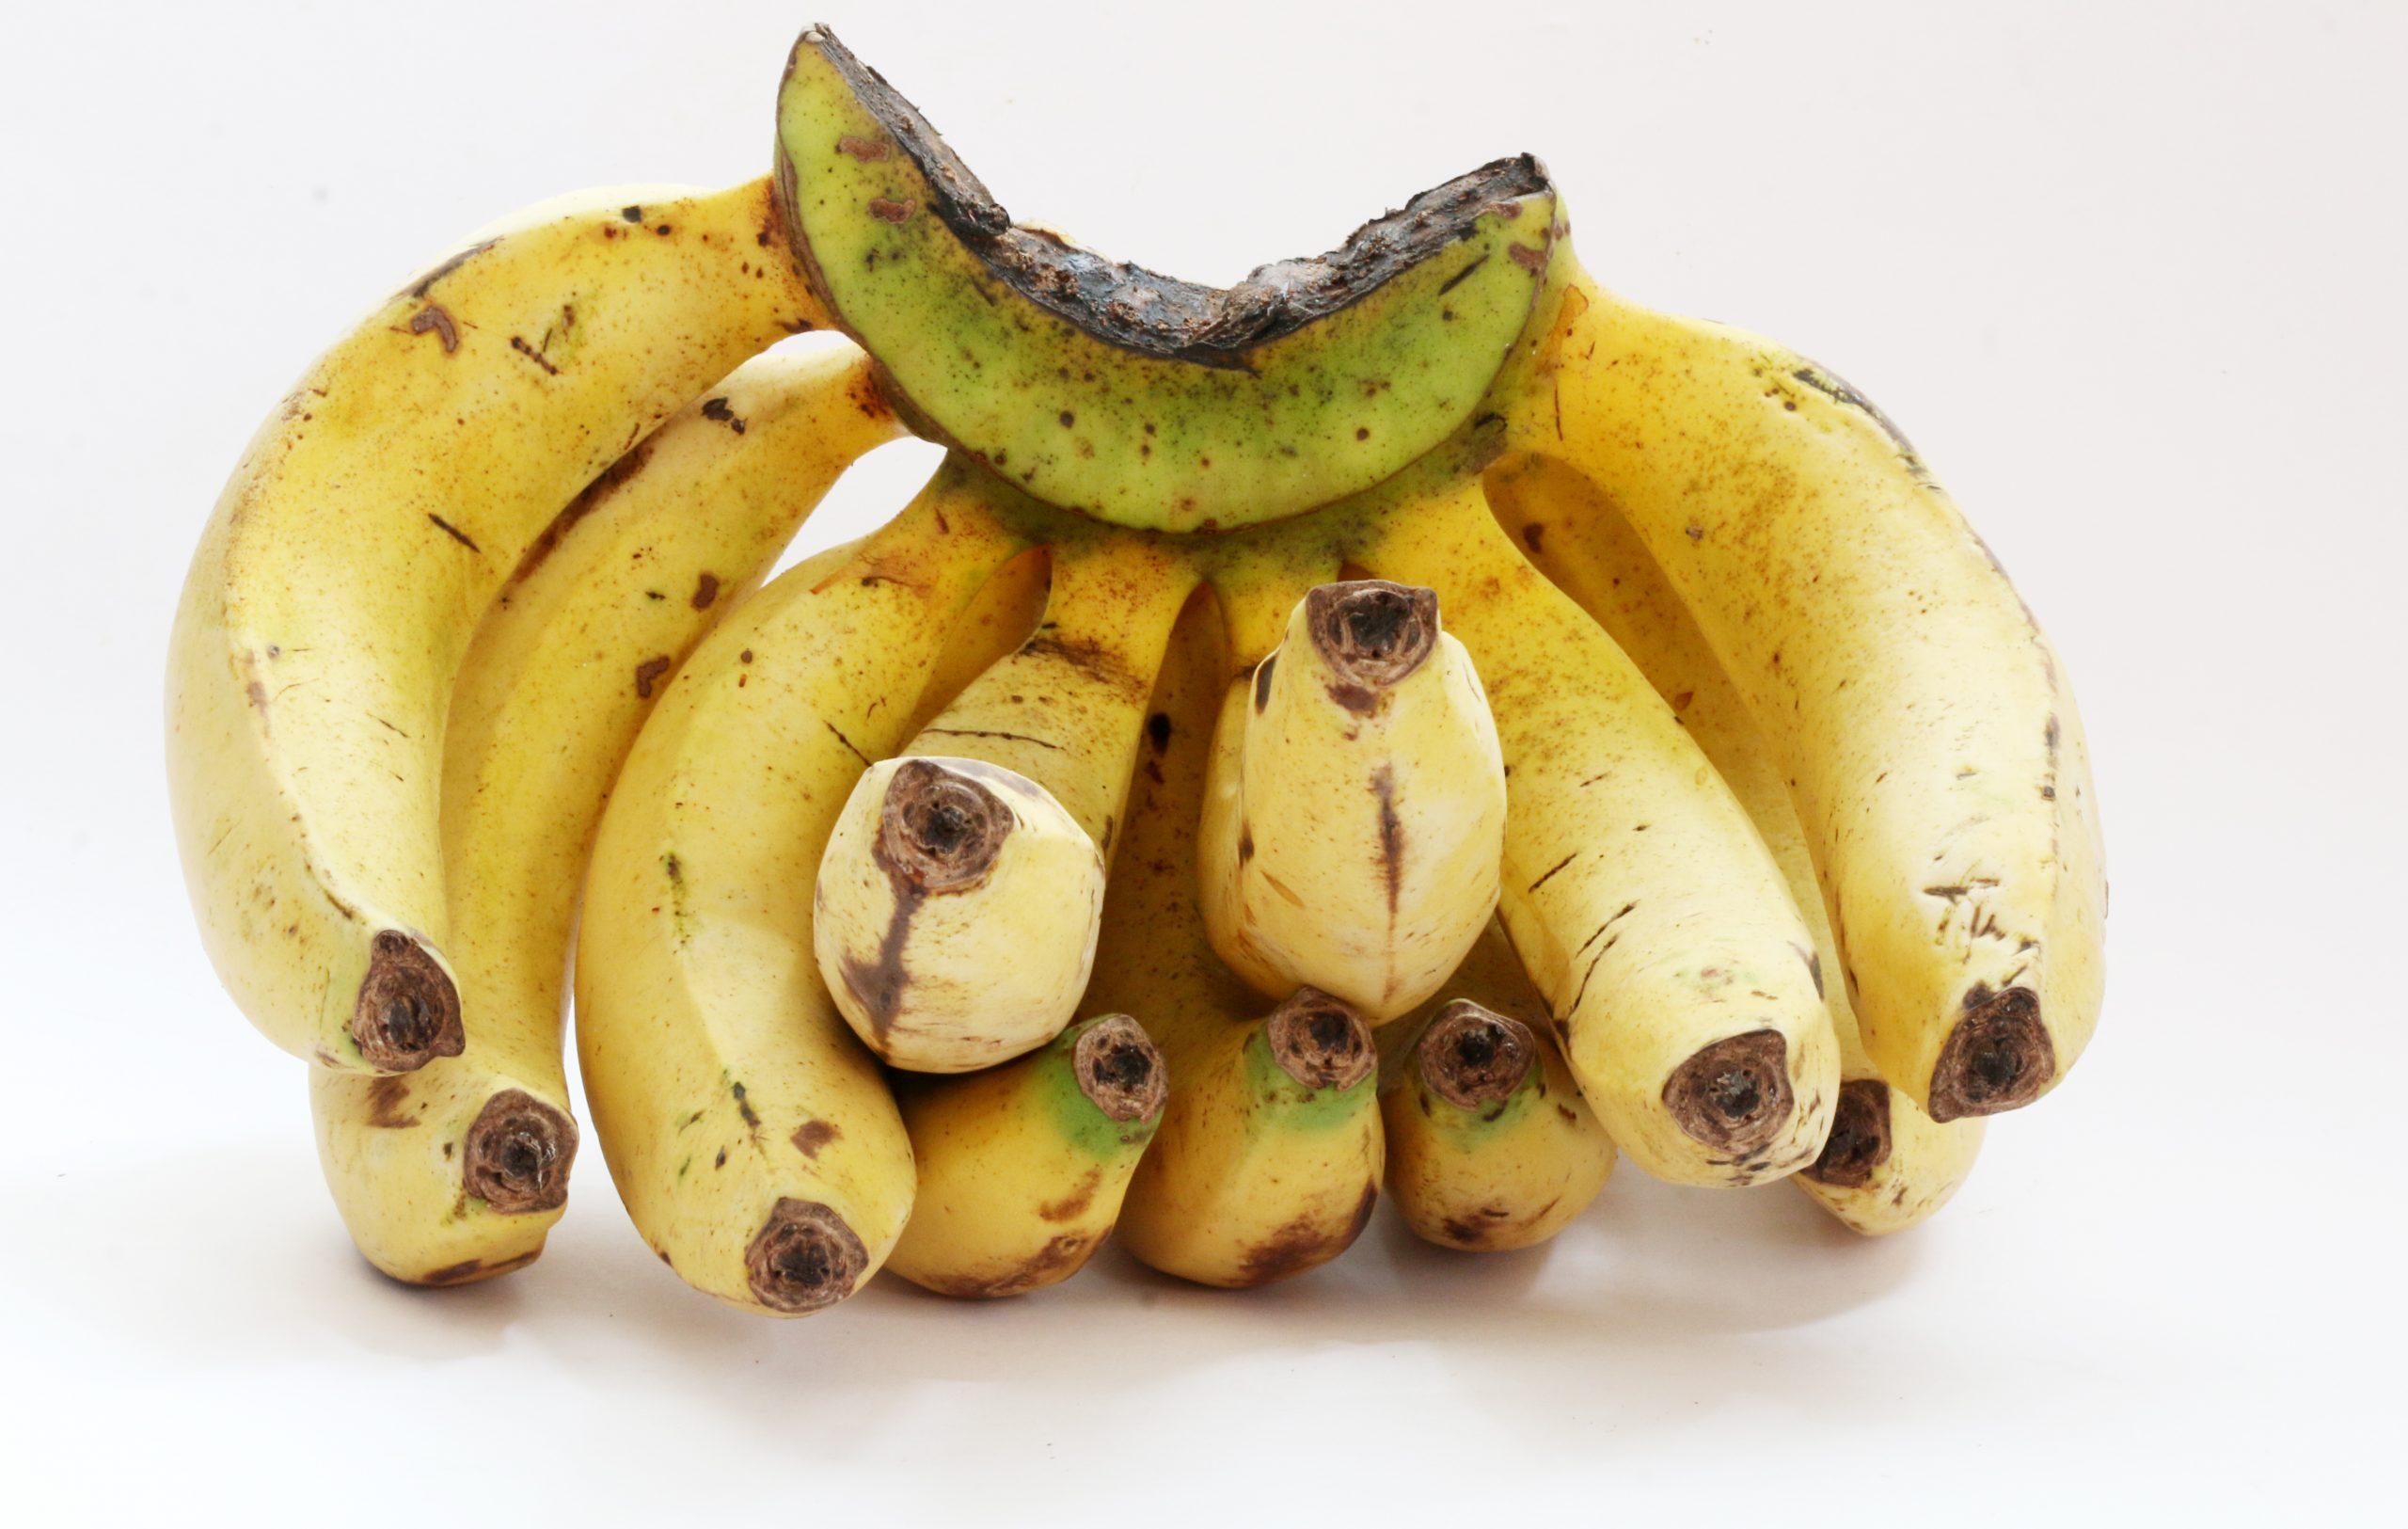 A banana cluster